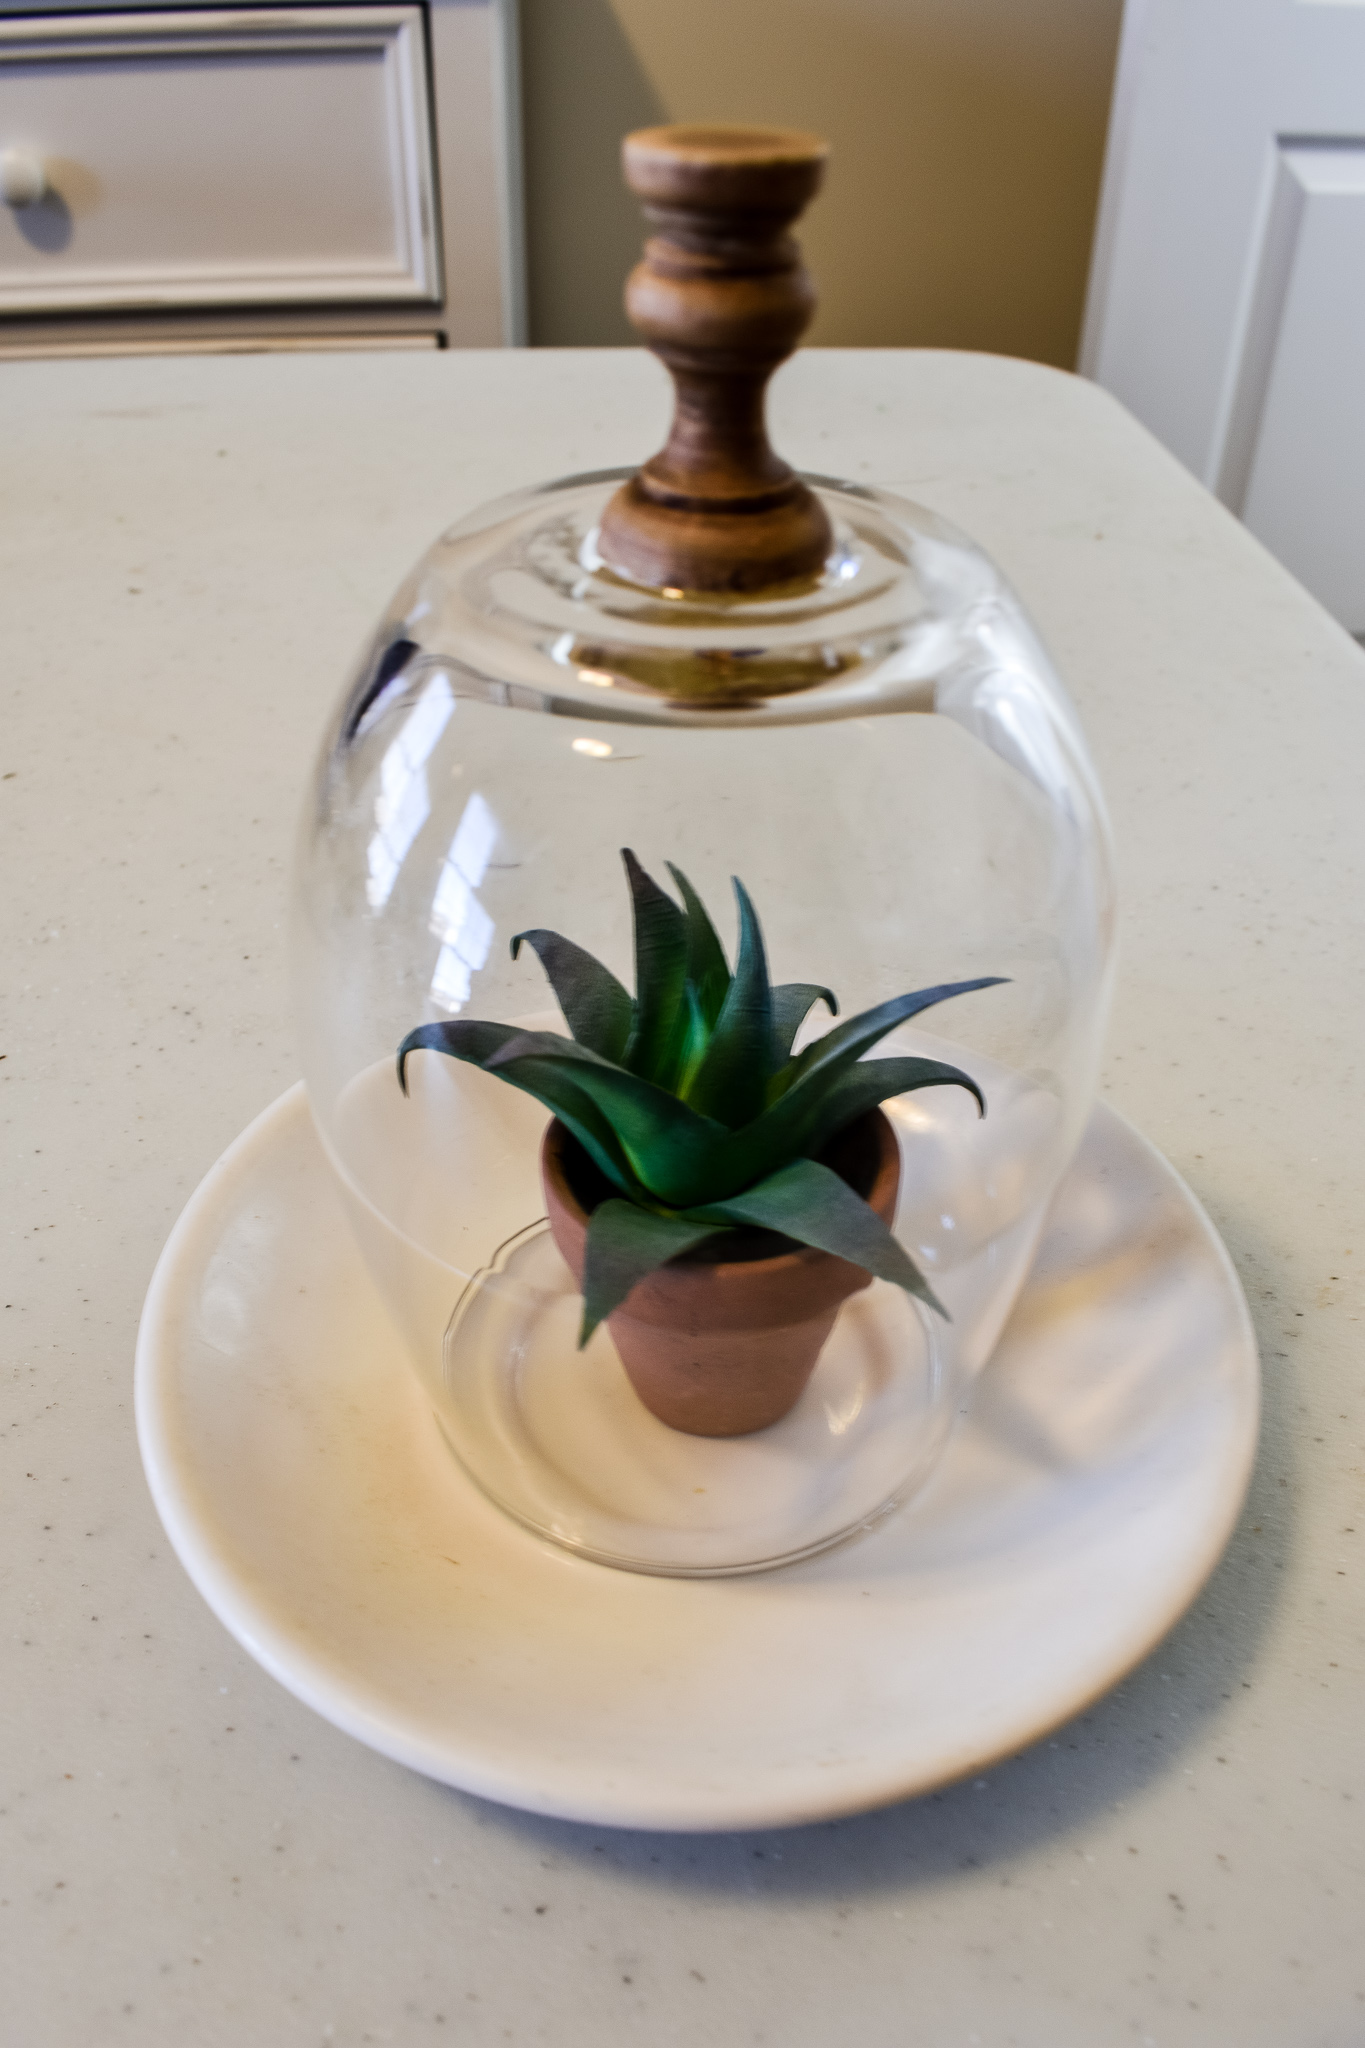 faux succulent in a small terra cotta flower pot under a cloche